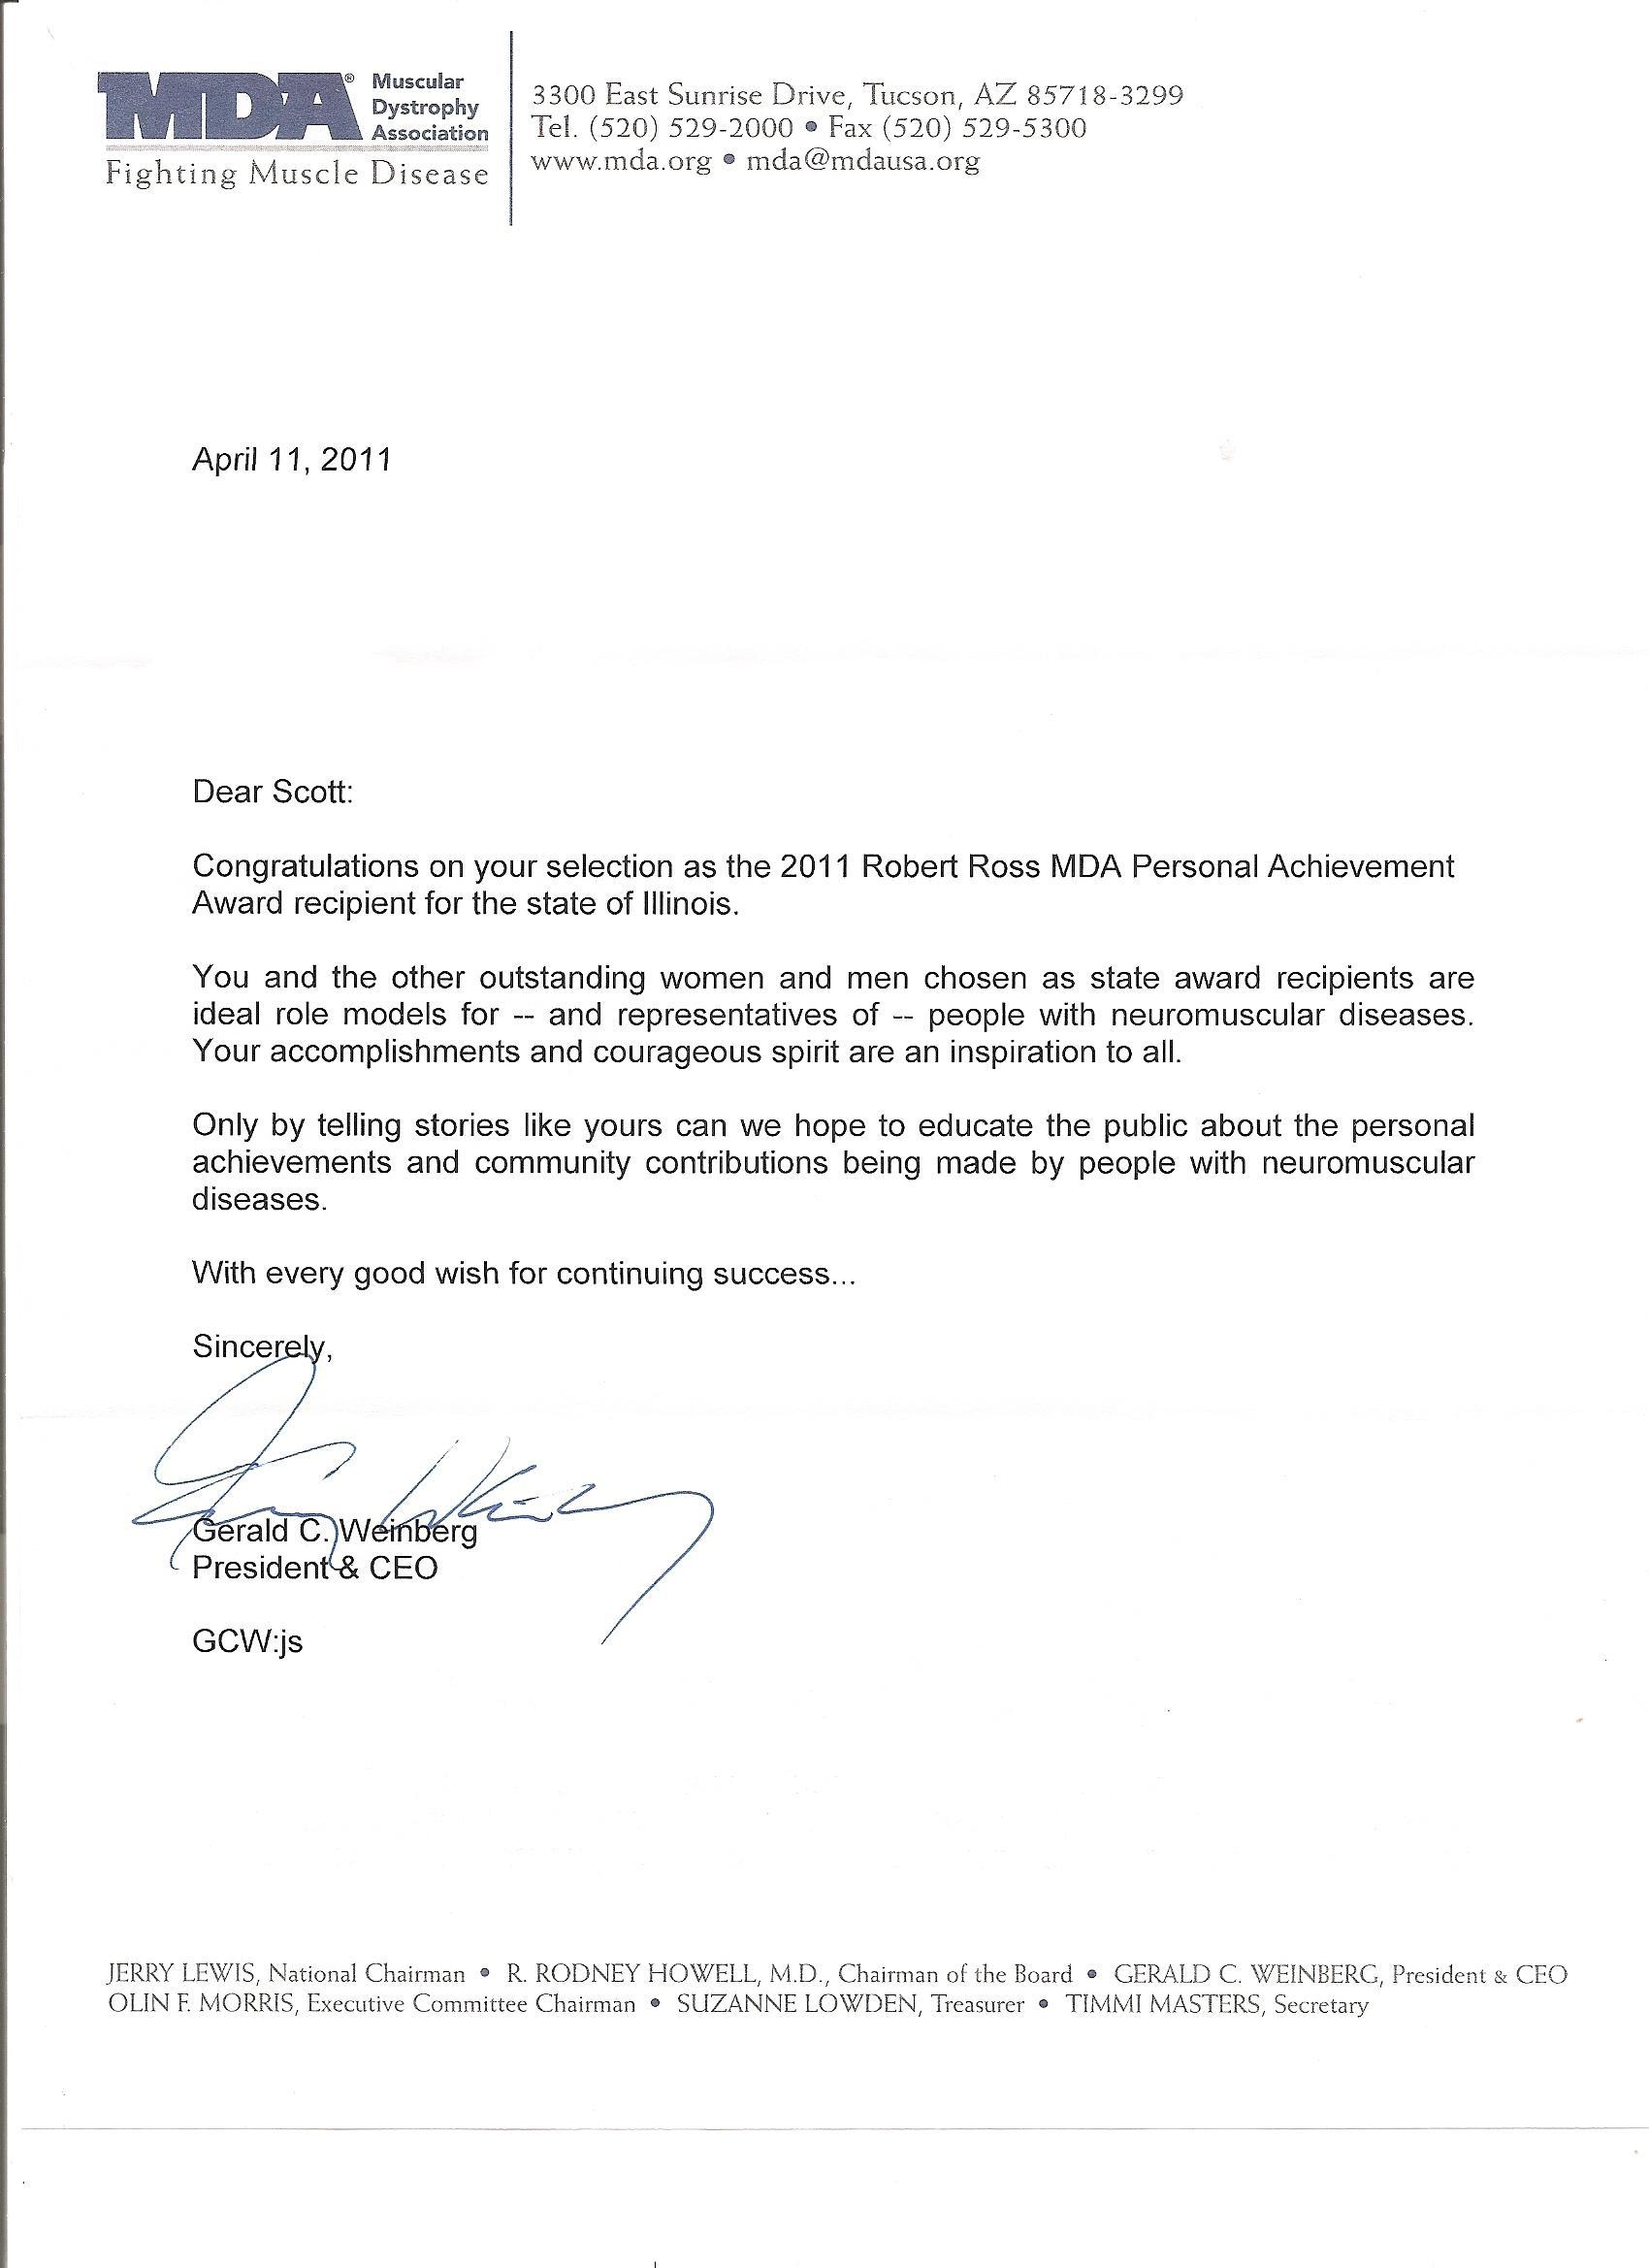 congratulations letter - solarfm.tk